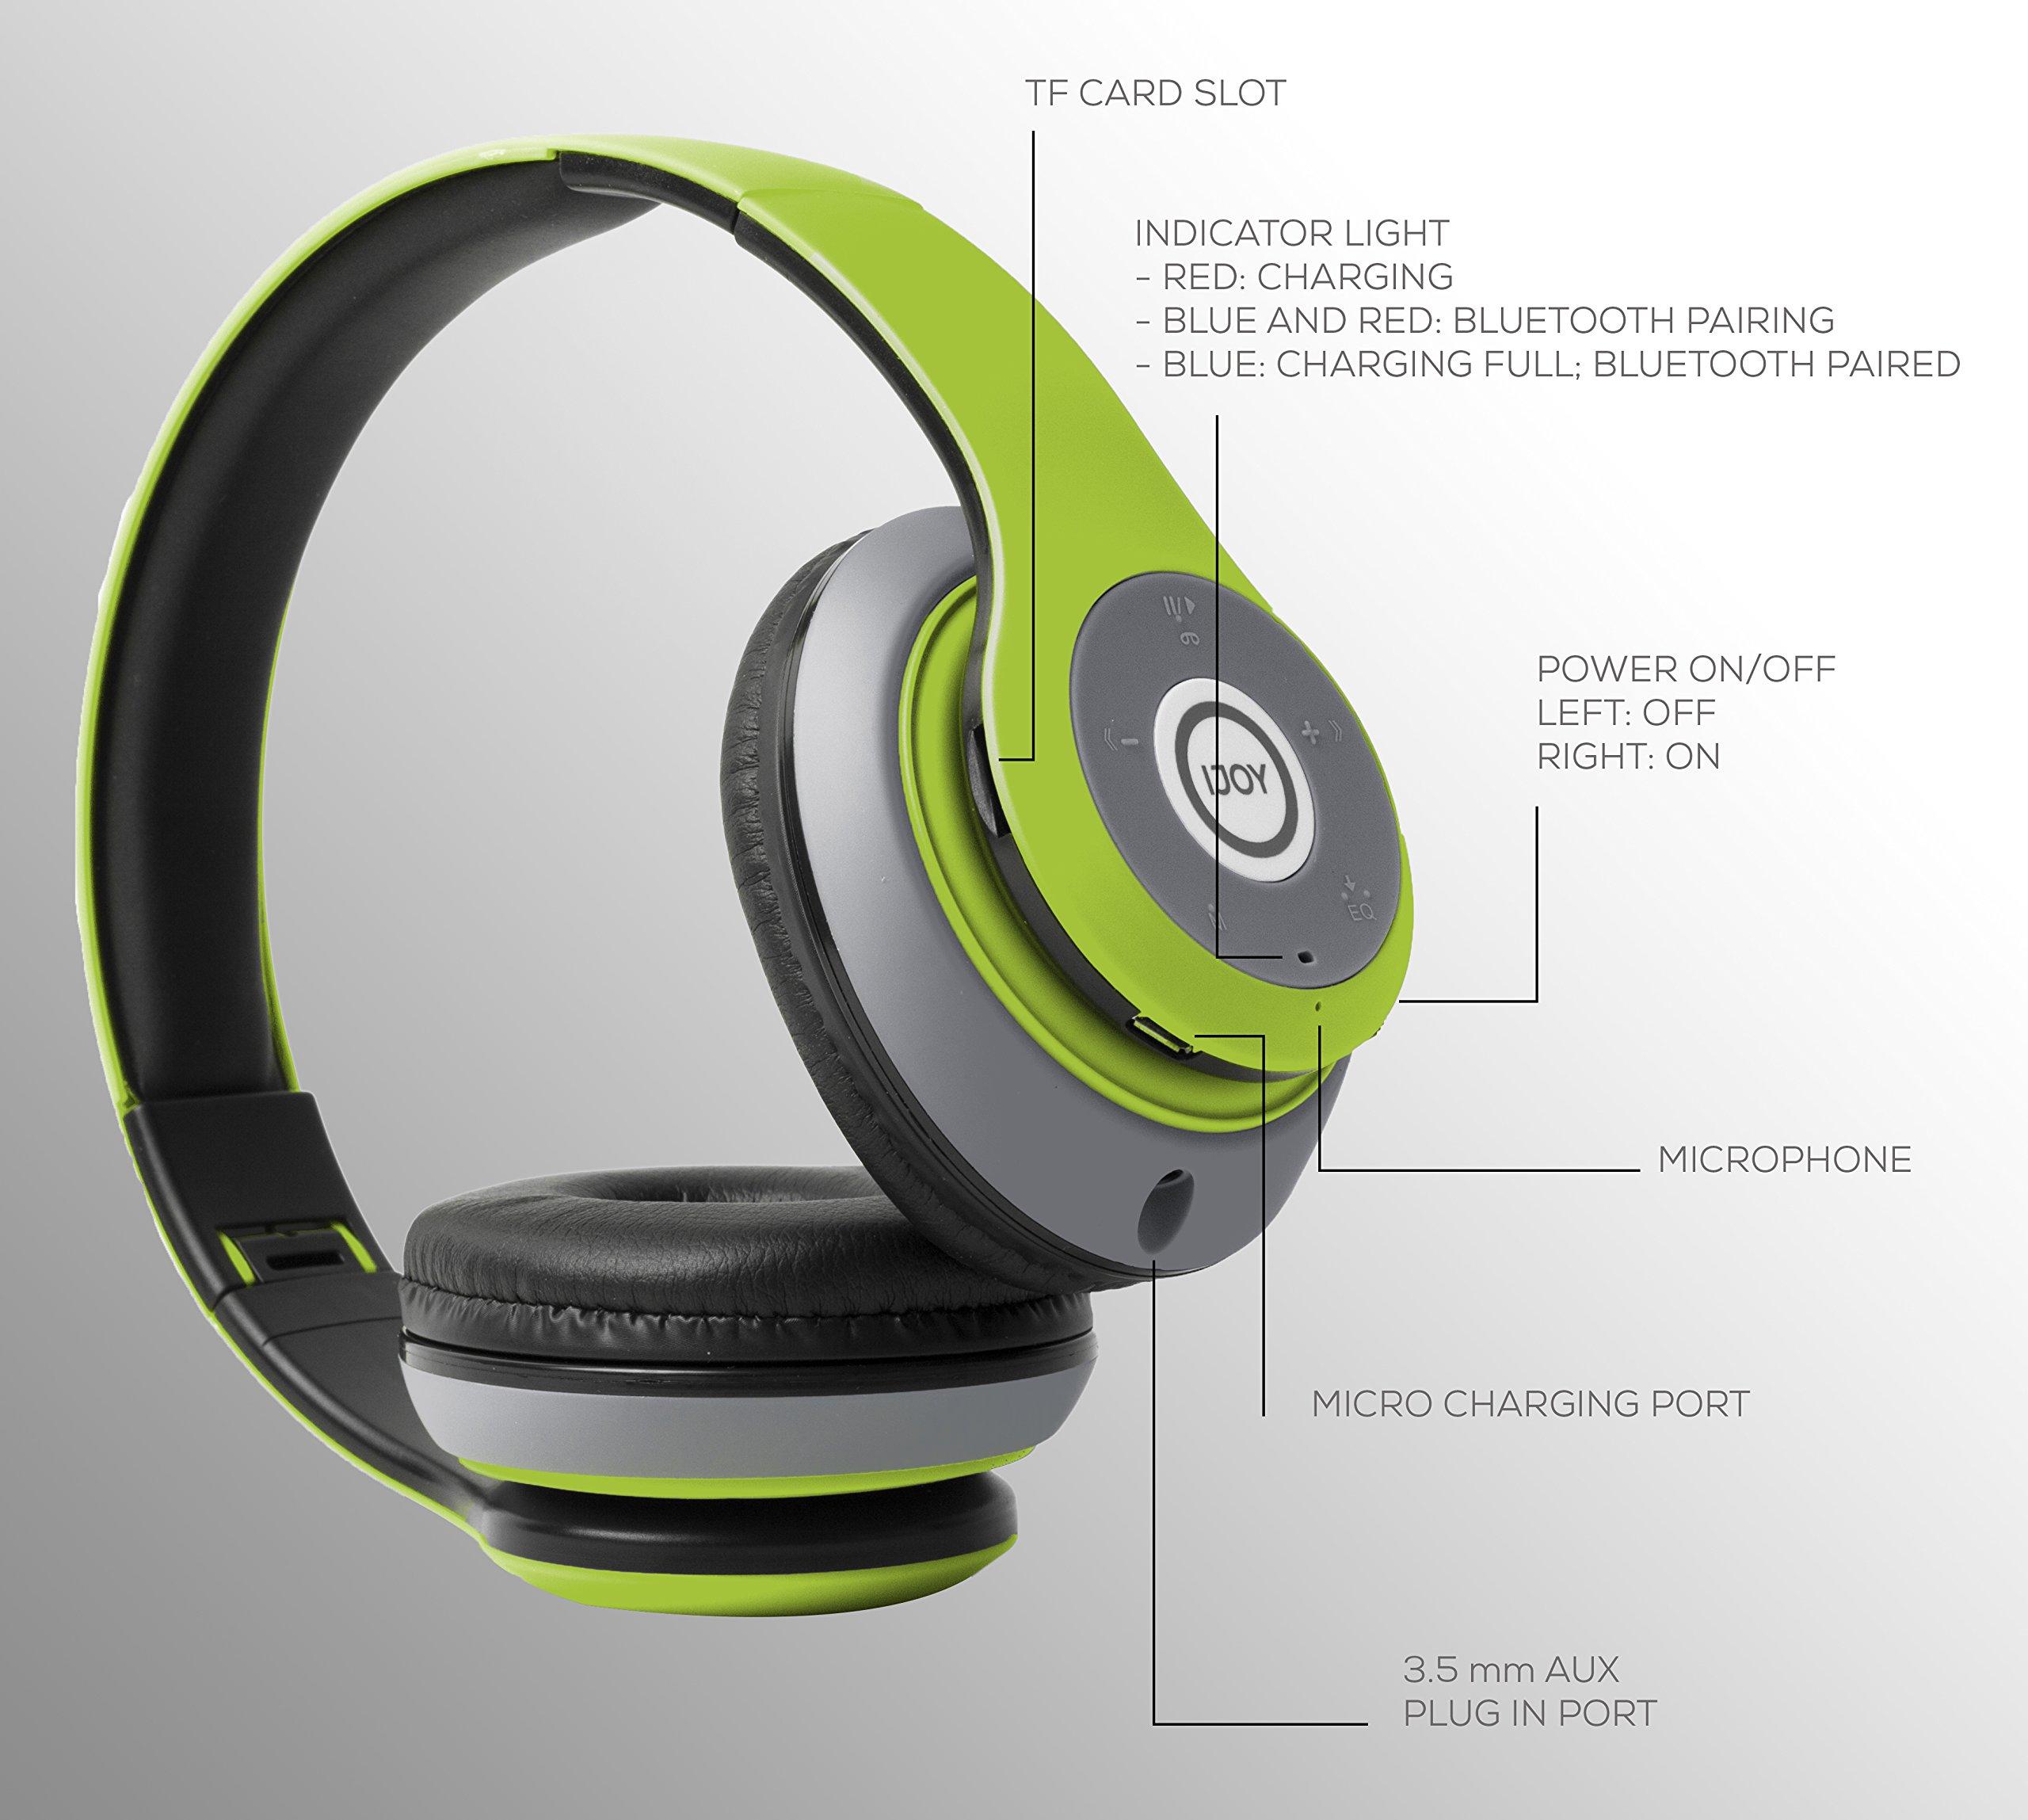 iJoy Matte Finish Premium Rechargeable Wireless Headphones Bluetooth